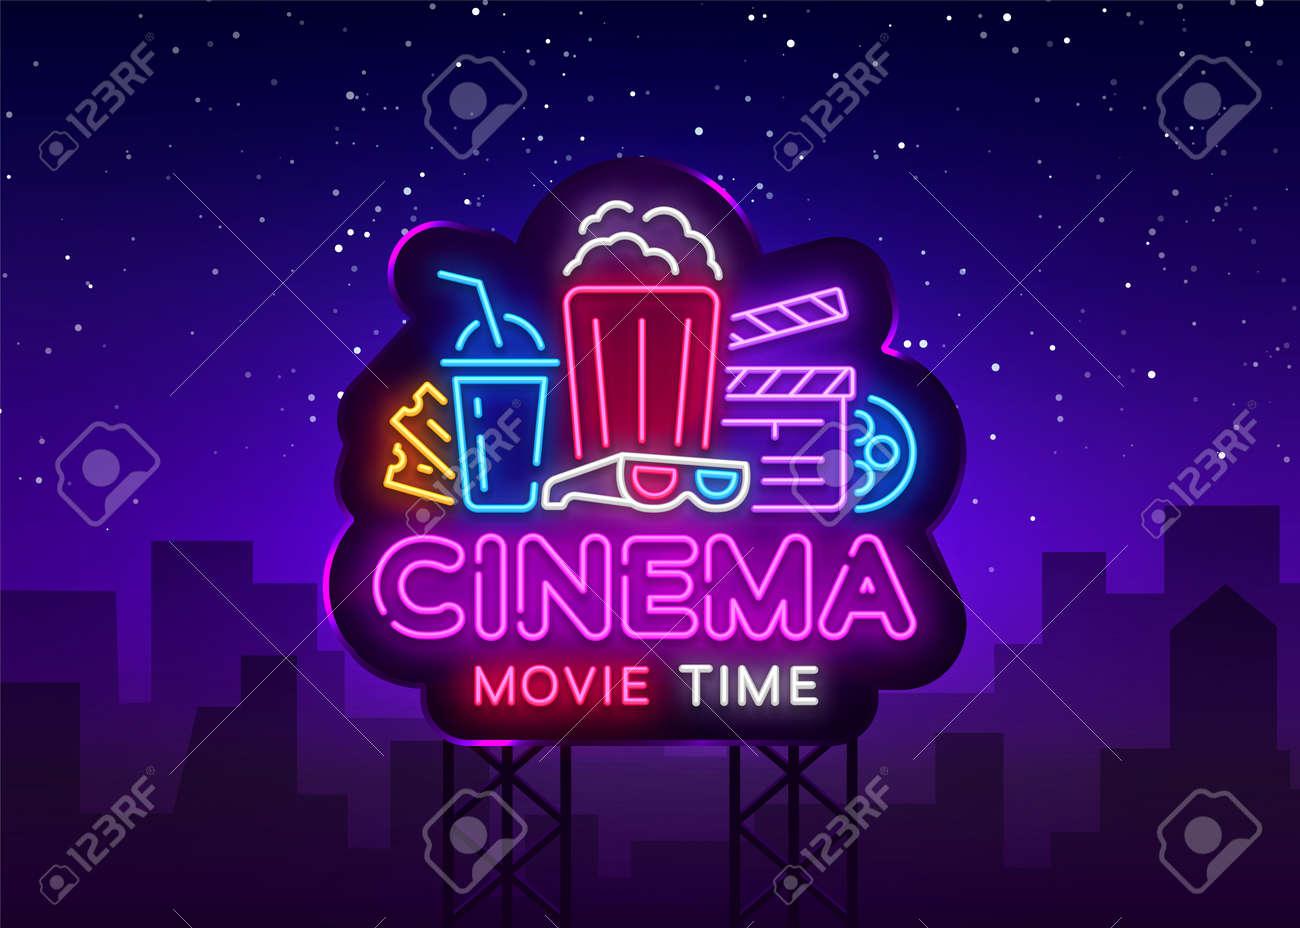 Movie Time Neon Logo Vector. Cinema Night neon sign, design template, modern trend design, night neon signboard, night light advertising, light banner, light art. Vector illustration. Billboard. - 108046191